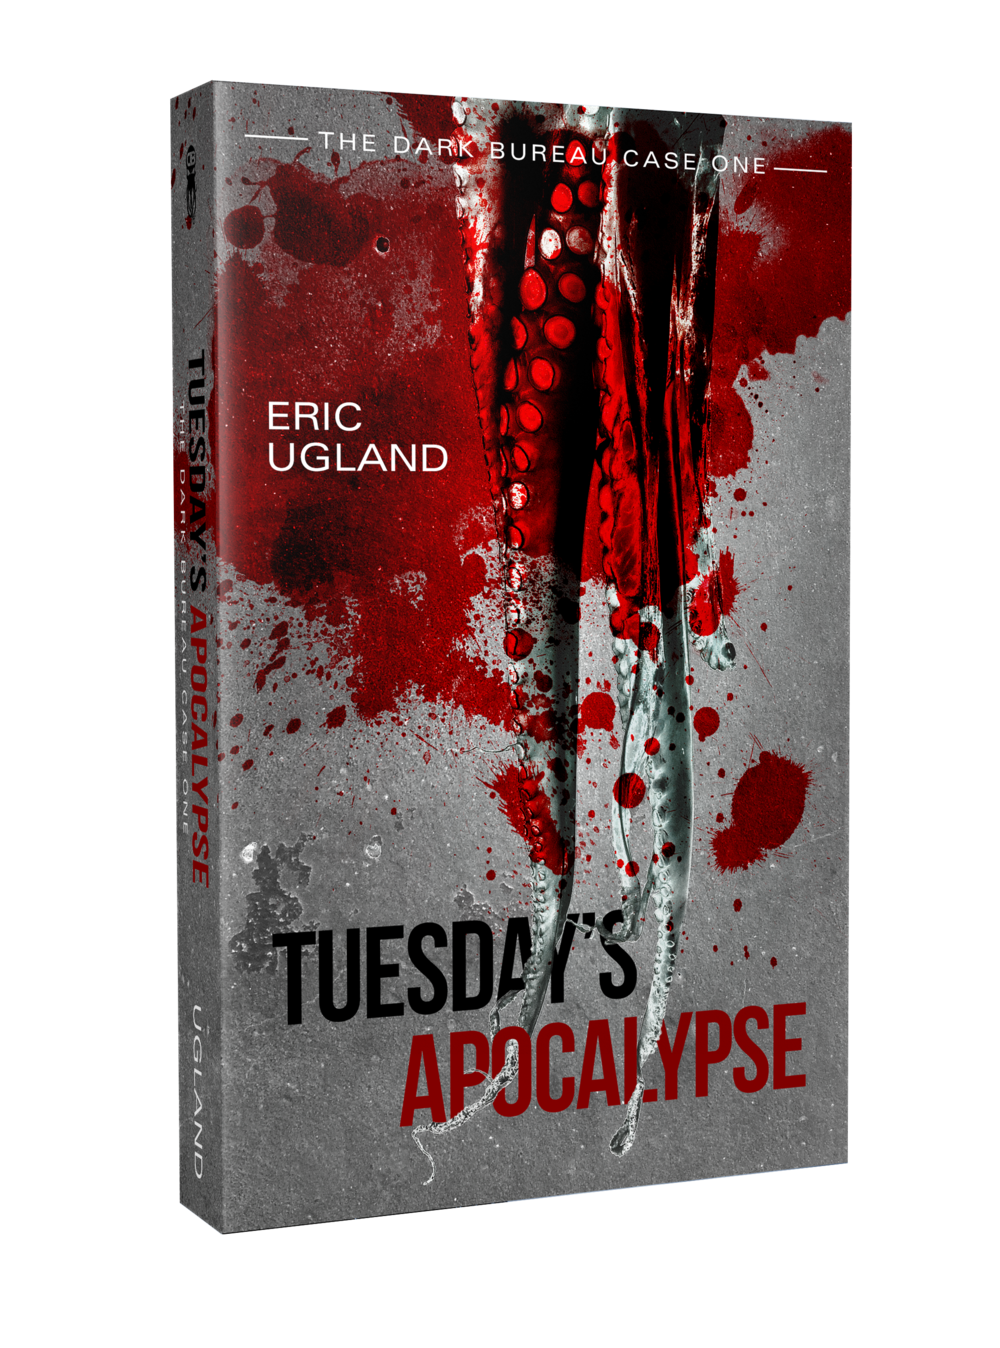 Ugland_TUESDAY'S-APOCALYPSE_3D-mockup_2.png